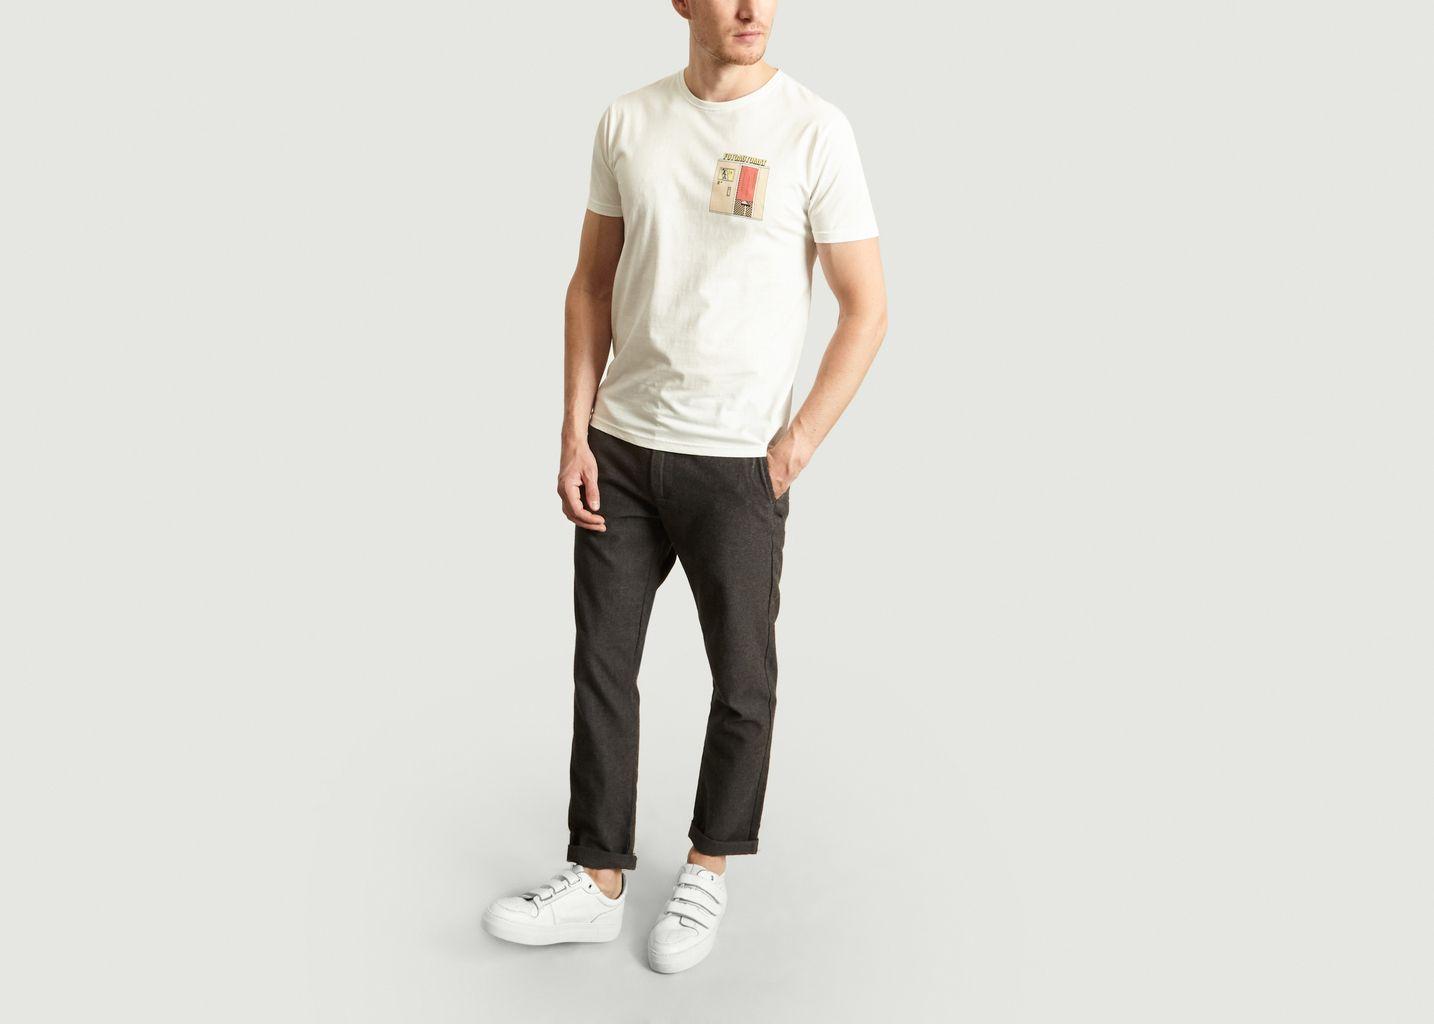 Pantalon Chino - Olow